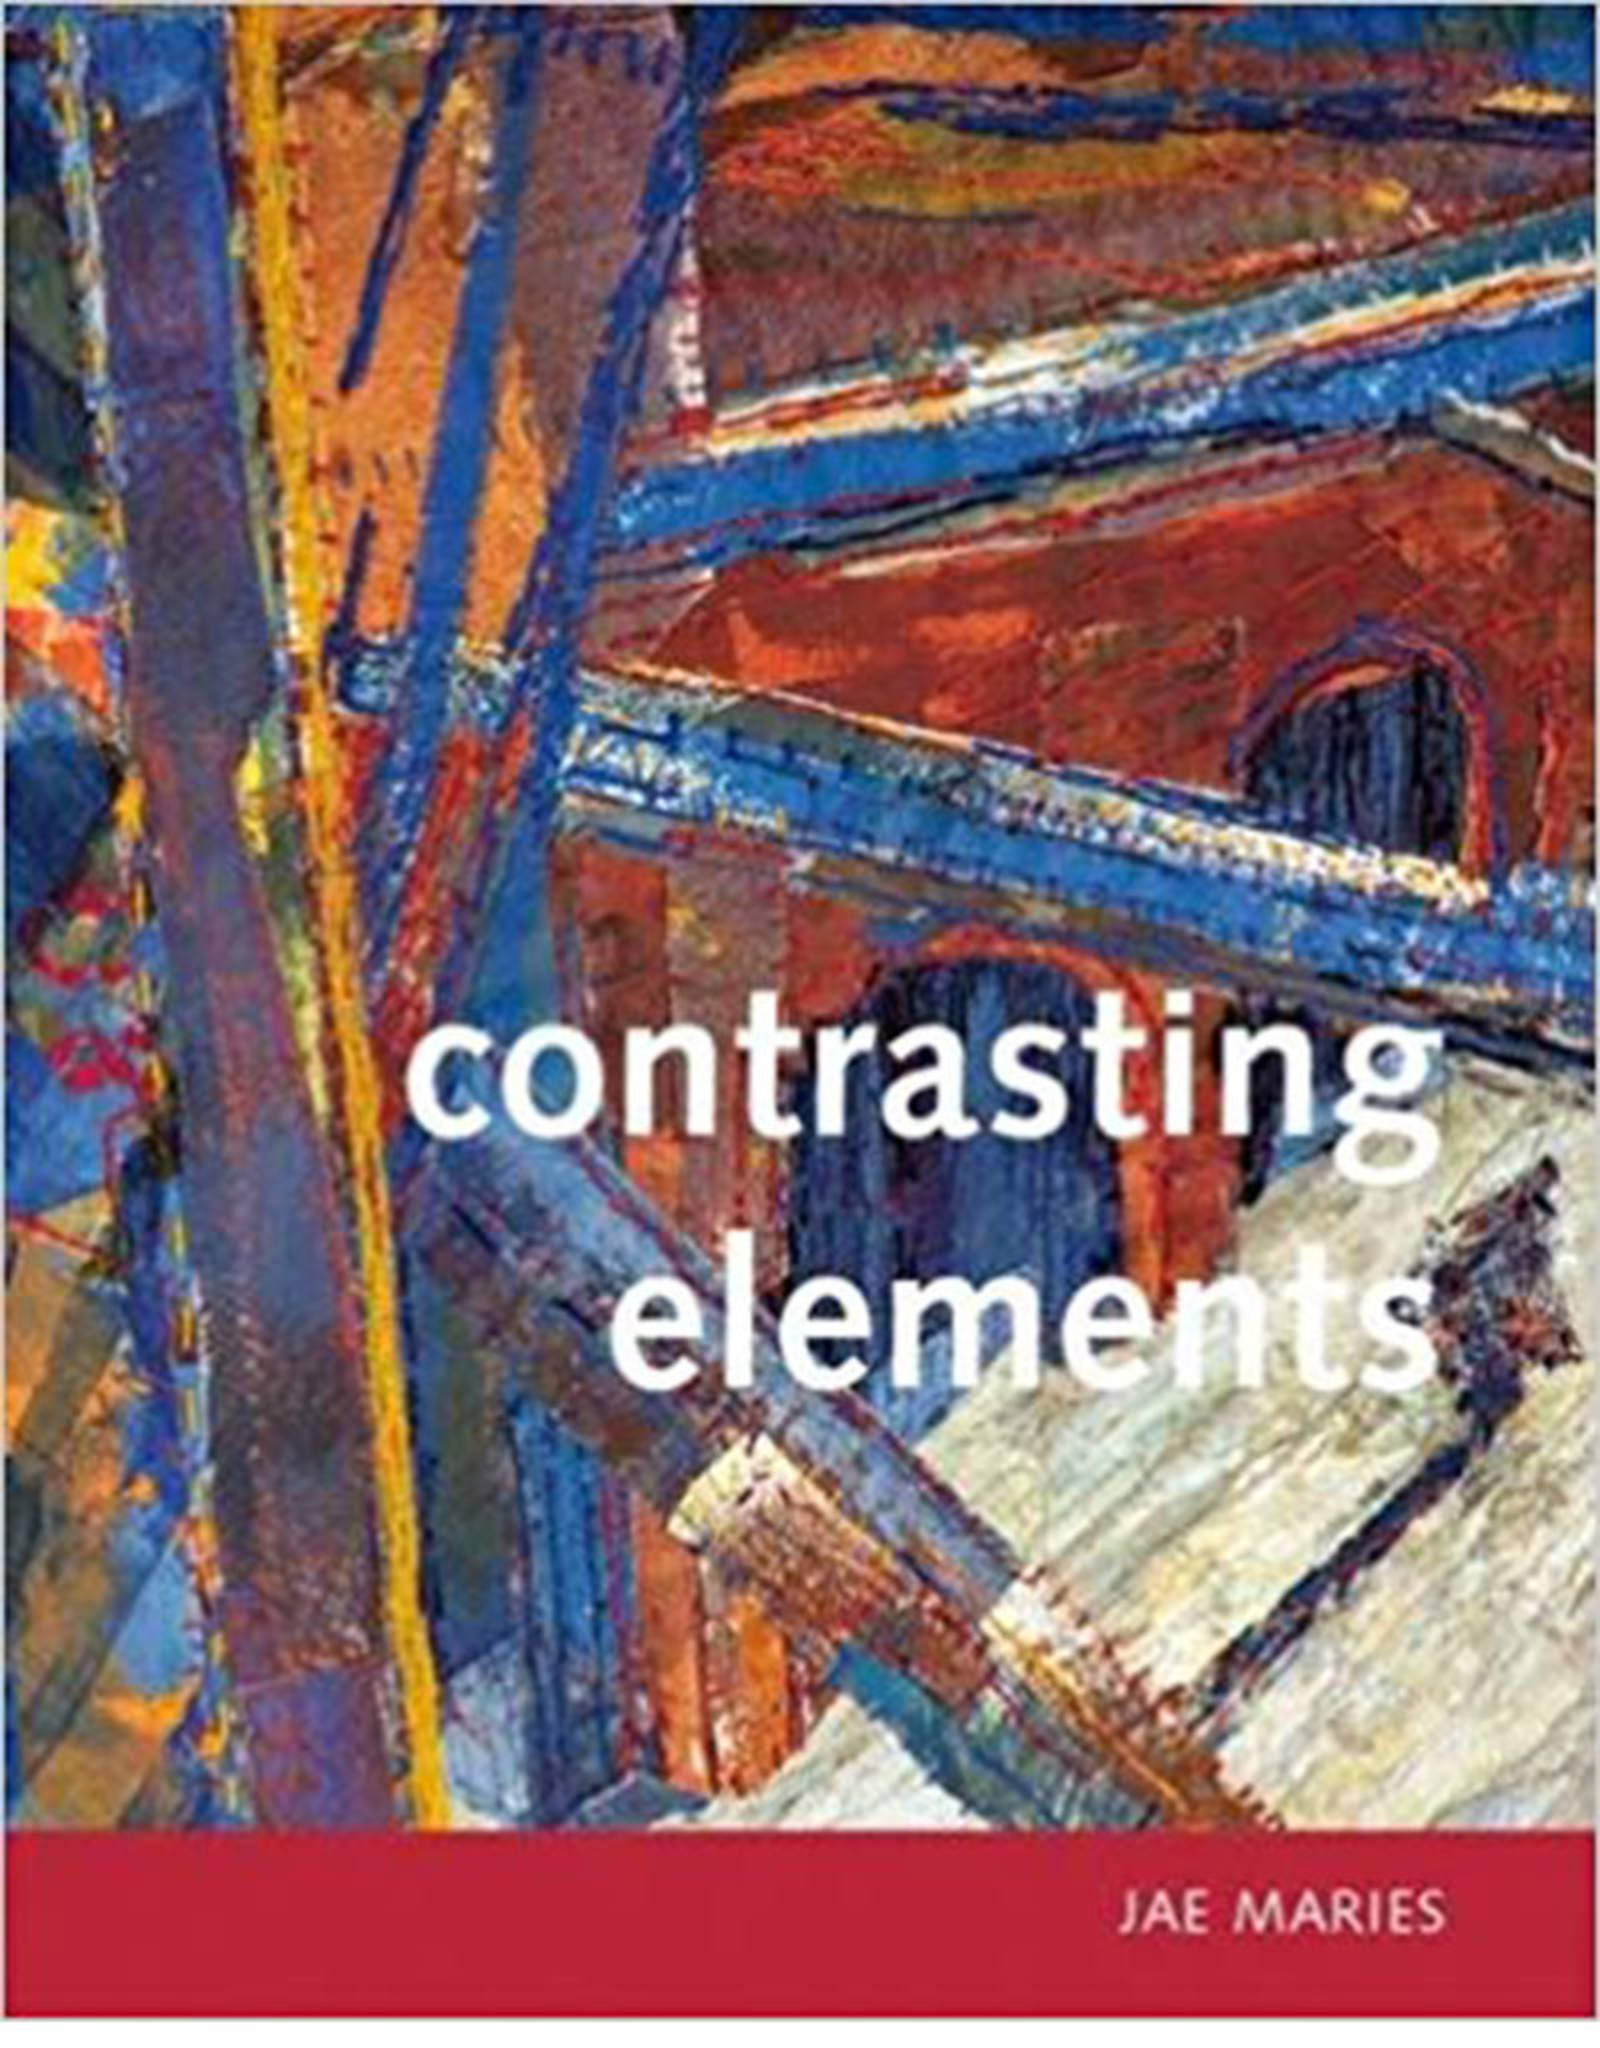 Contrasting Elements / Jae Maries